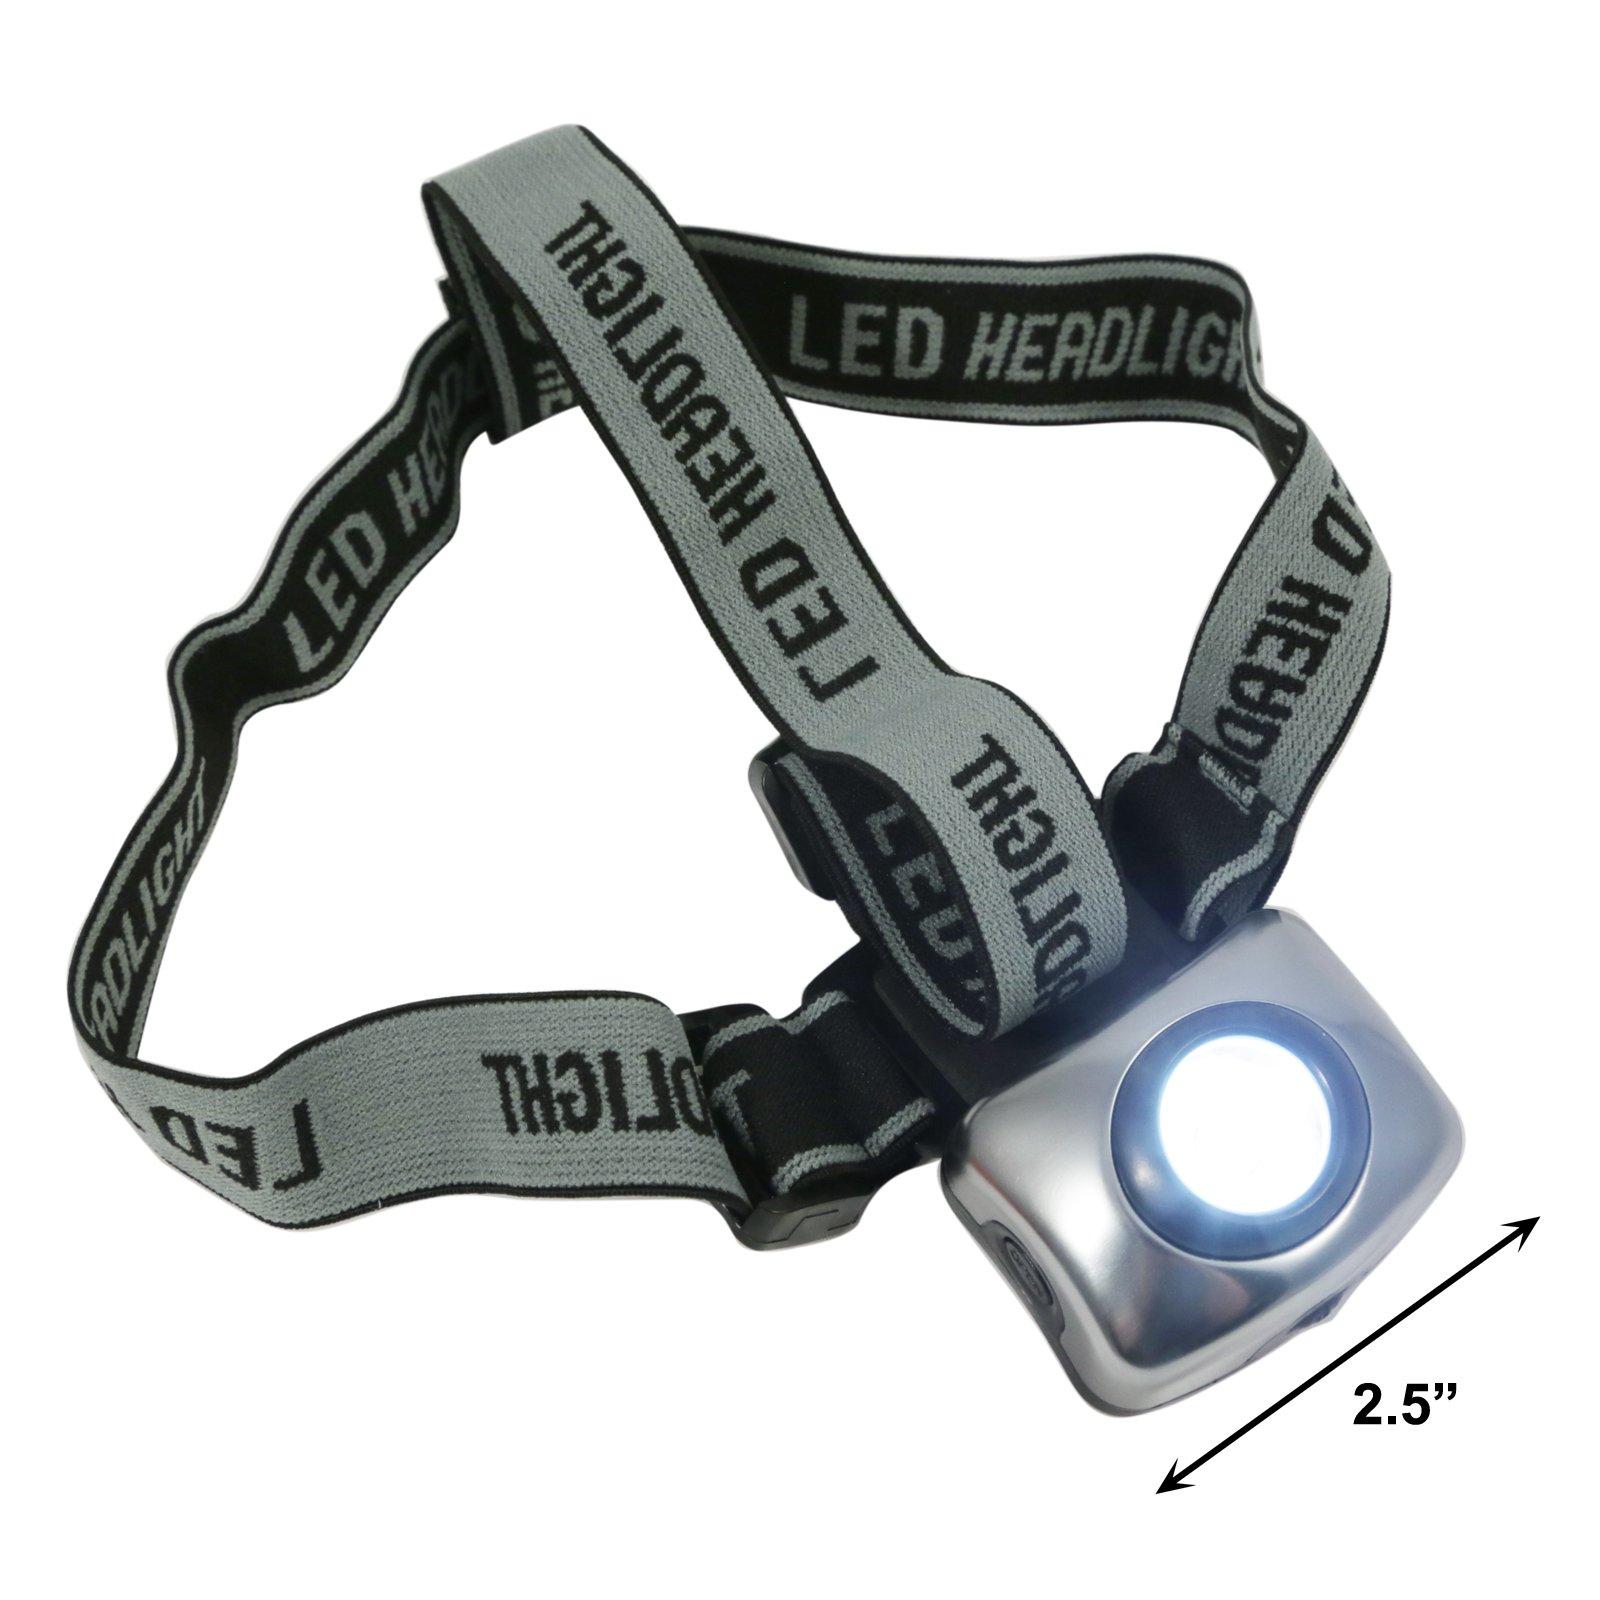 ASR Outdoor Adjustable Hiking Head Lamp 1 Watt LED